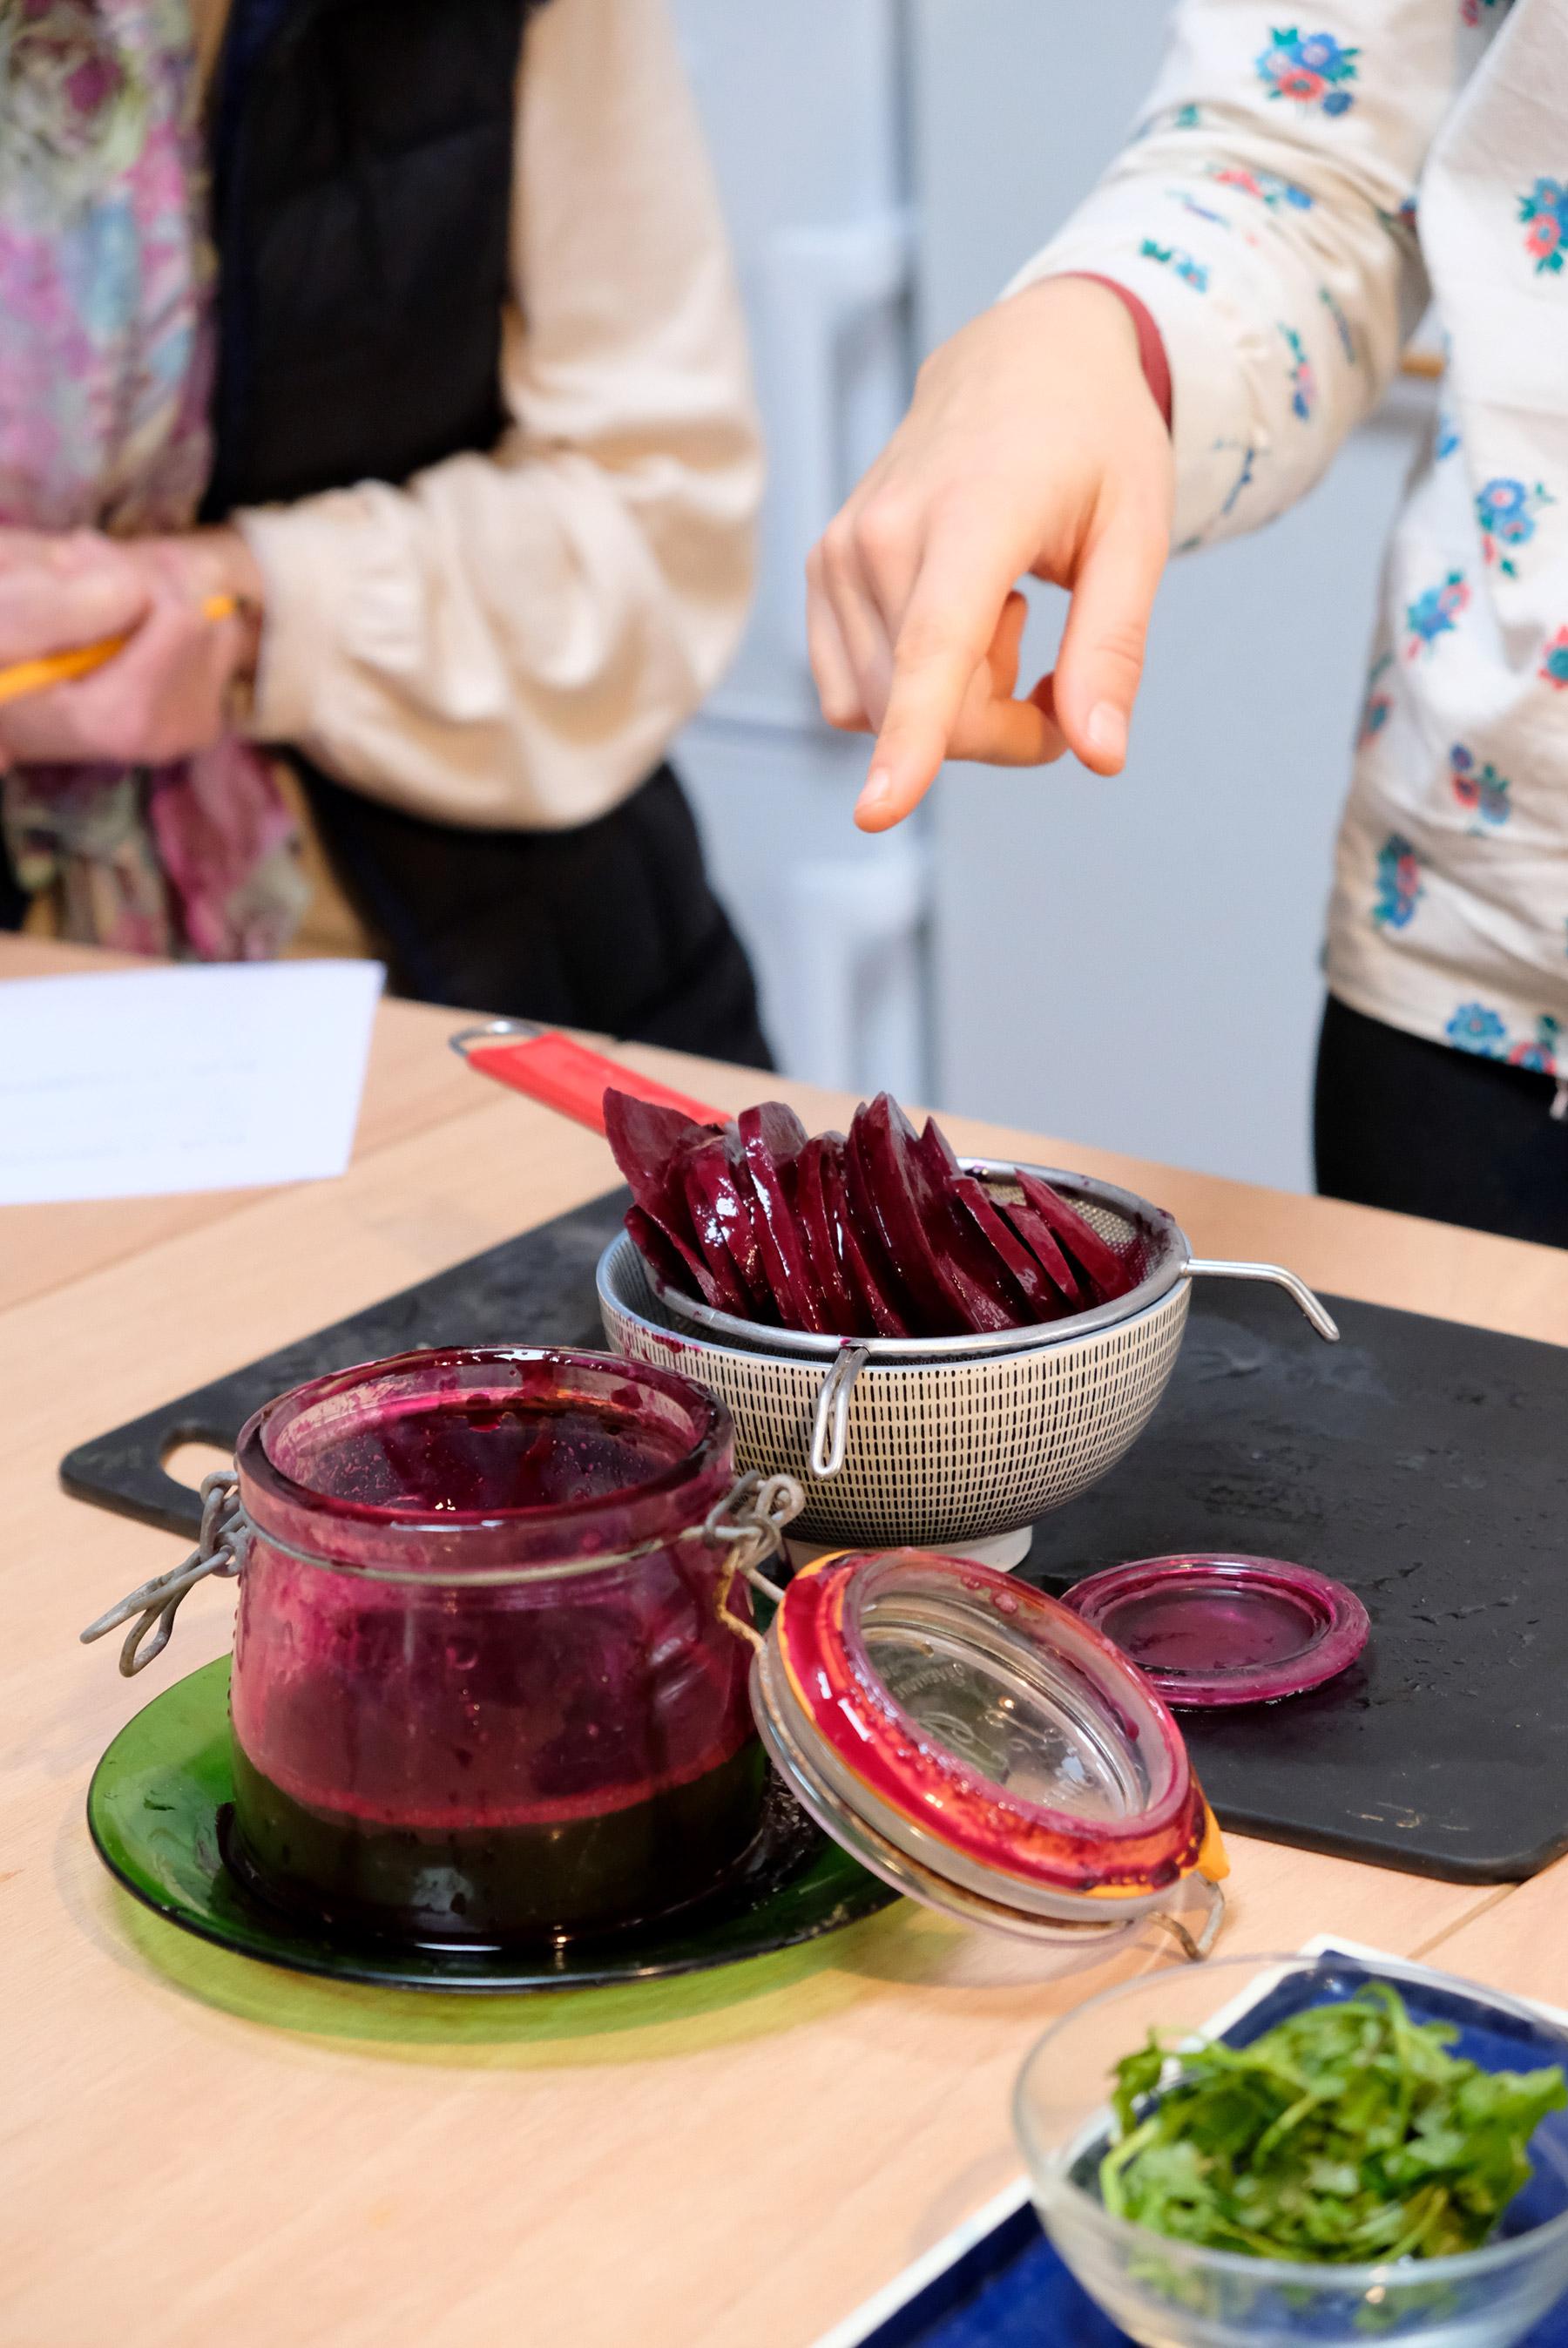 Atelier De La Cuisine Nantes blog-nantes-les-crawquantes-cuisine-crue-vegan7 - nantaise.fr